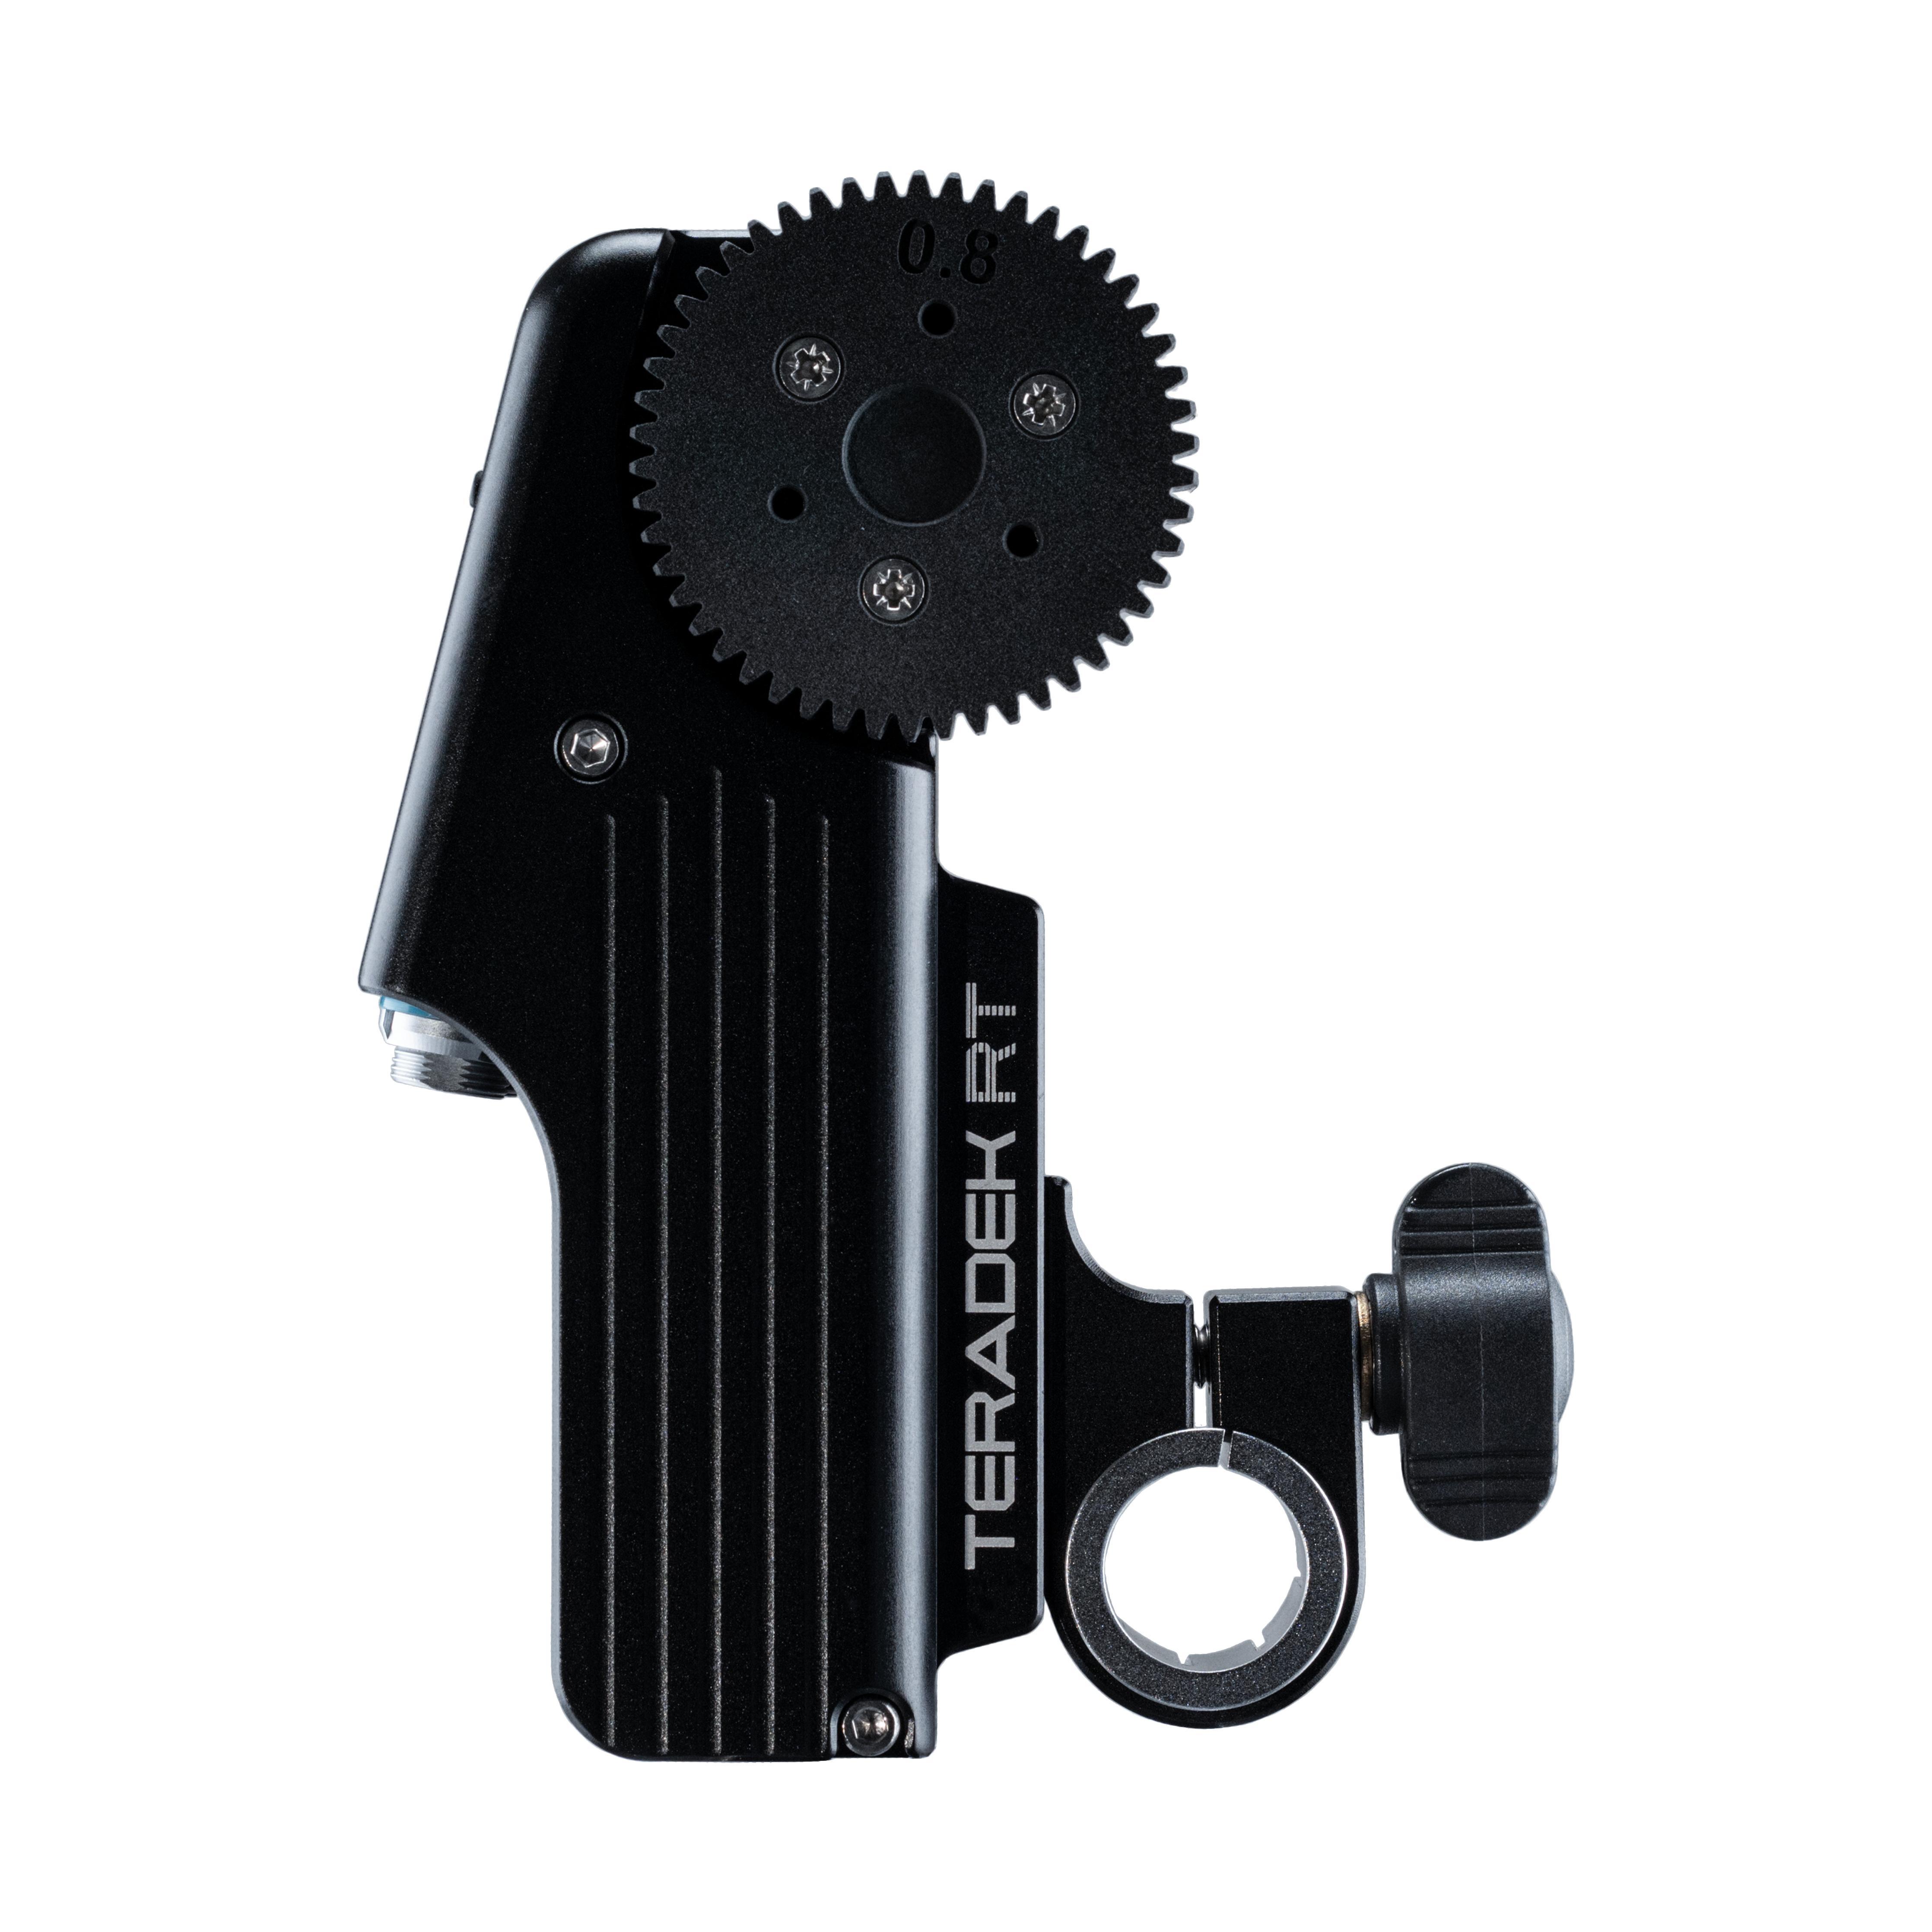 Teradek_RT_Super_Speed_Motor_Front_7e3801a5-4db1-4b2c-be0b-0974d295f968_png